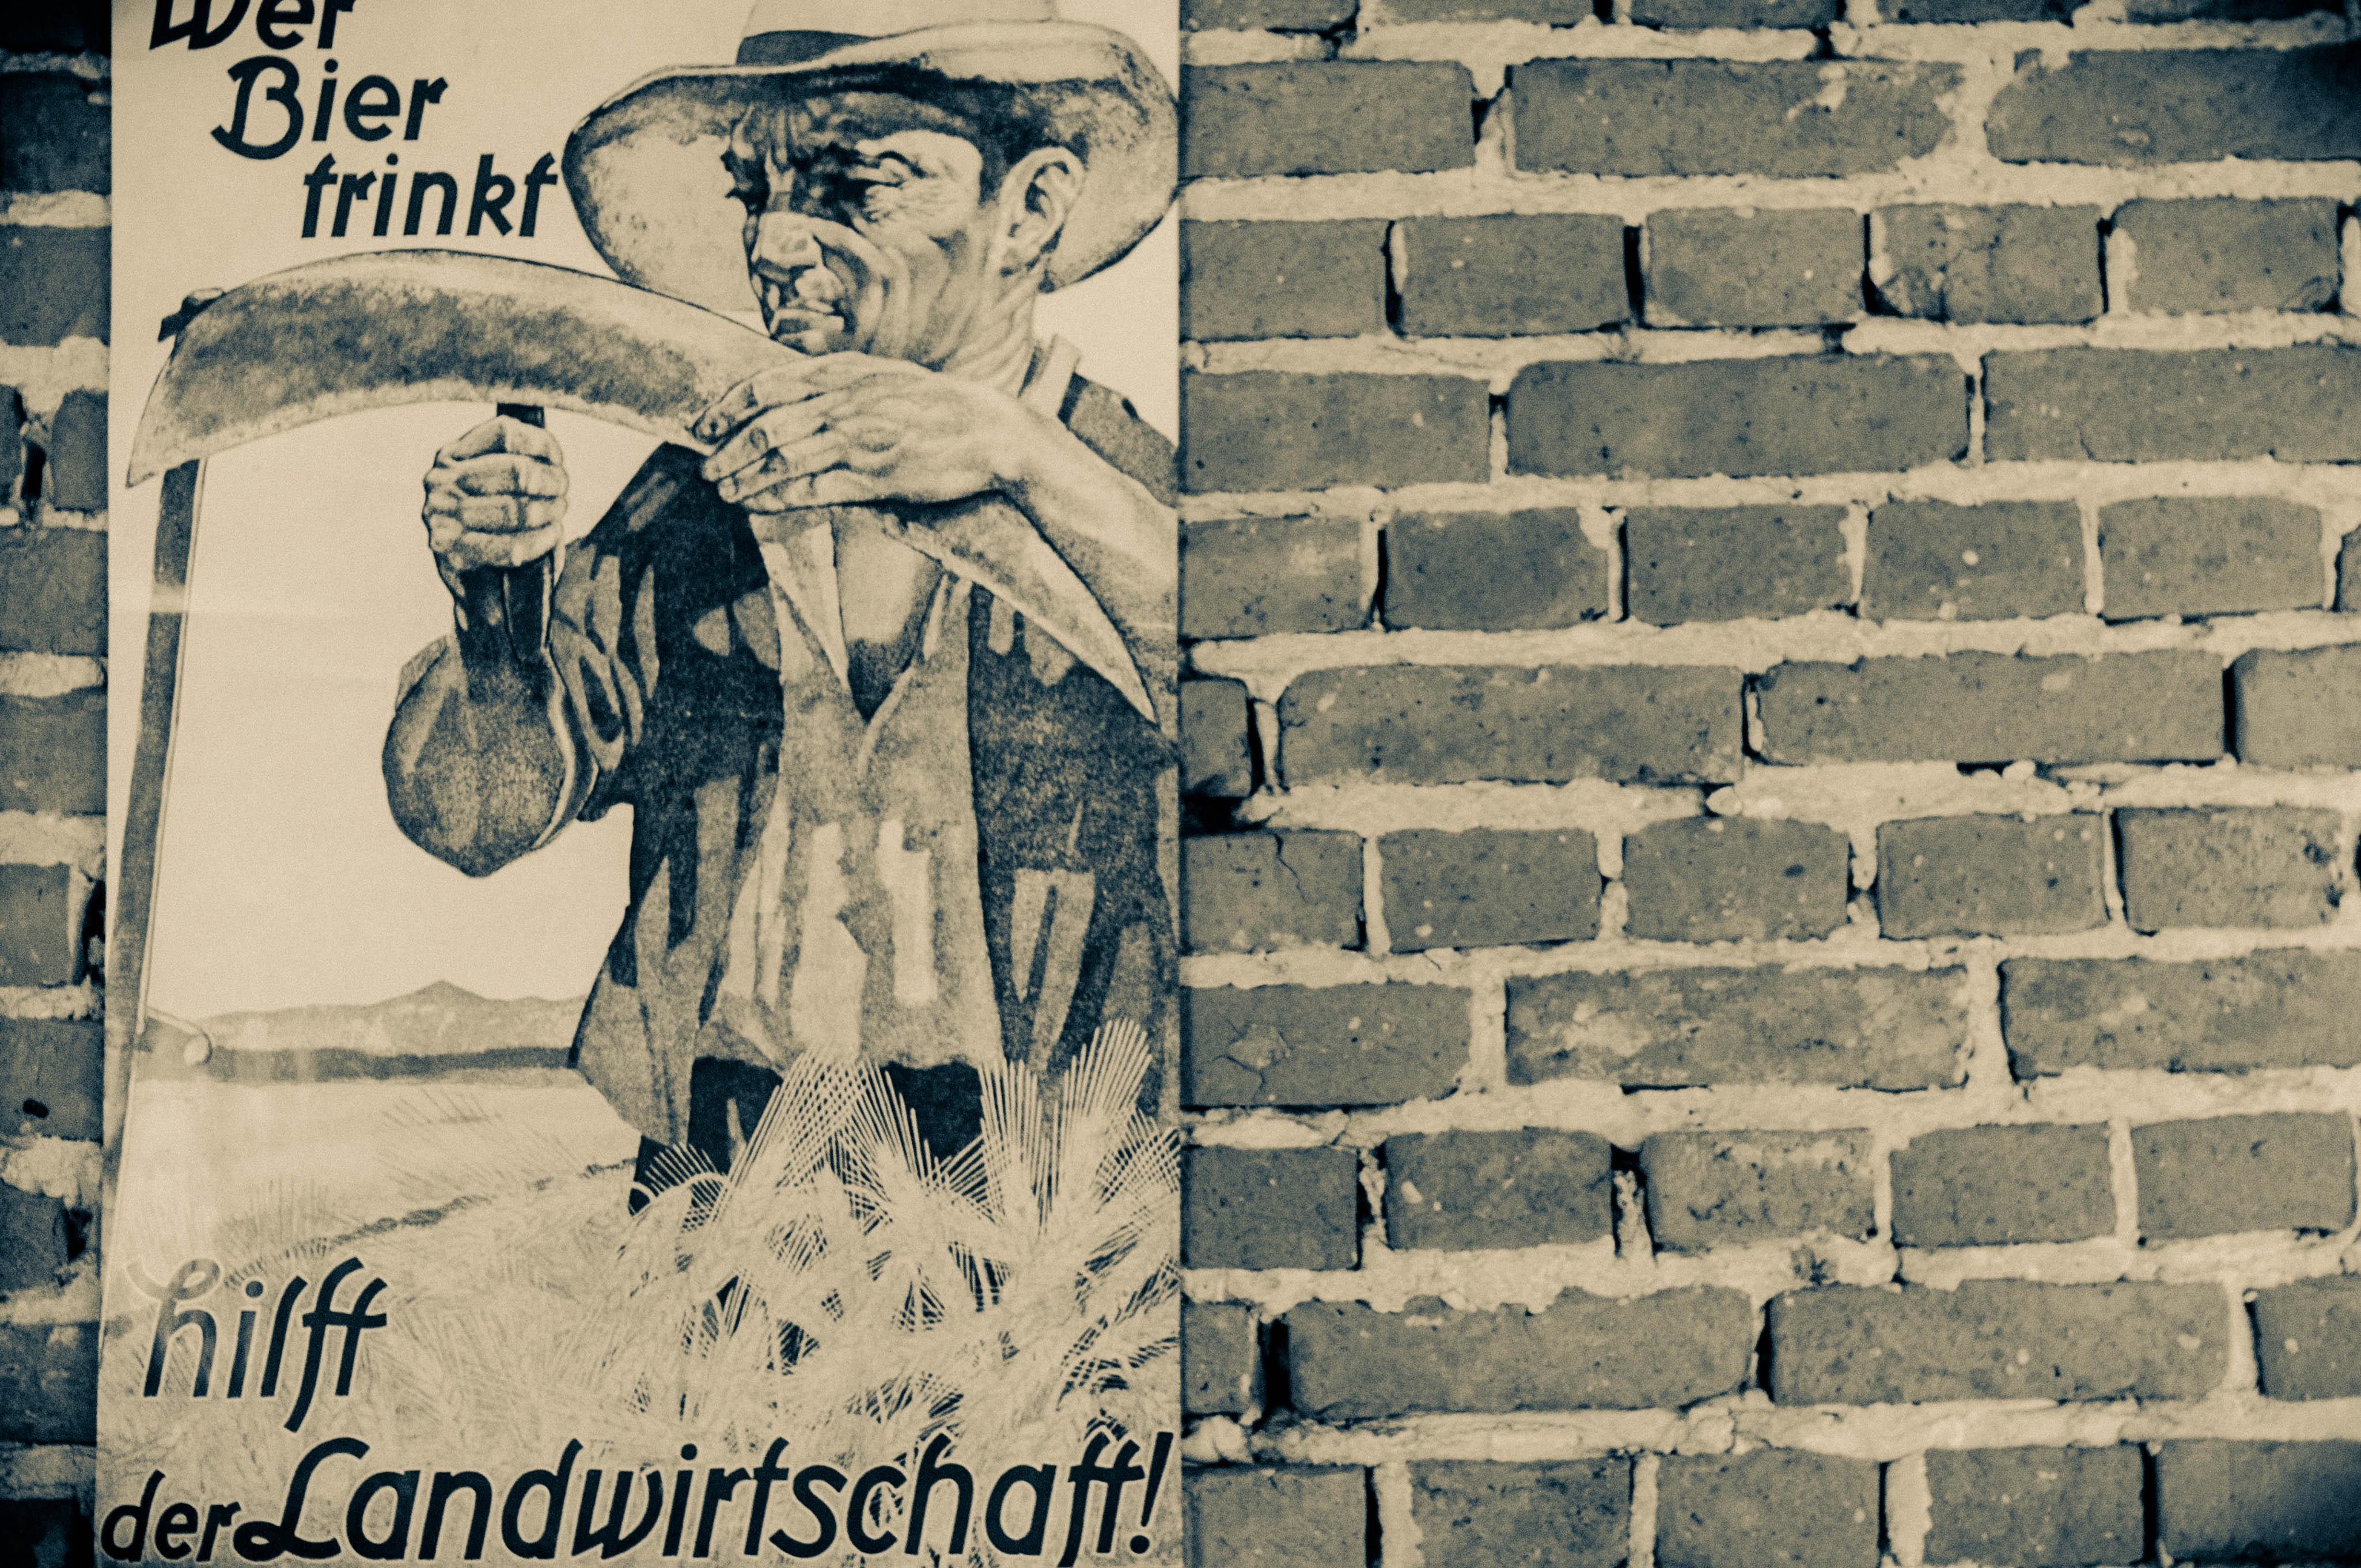 festscheune_062012-57-2